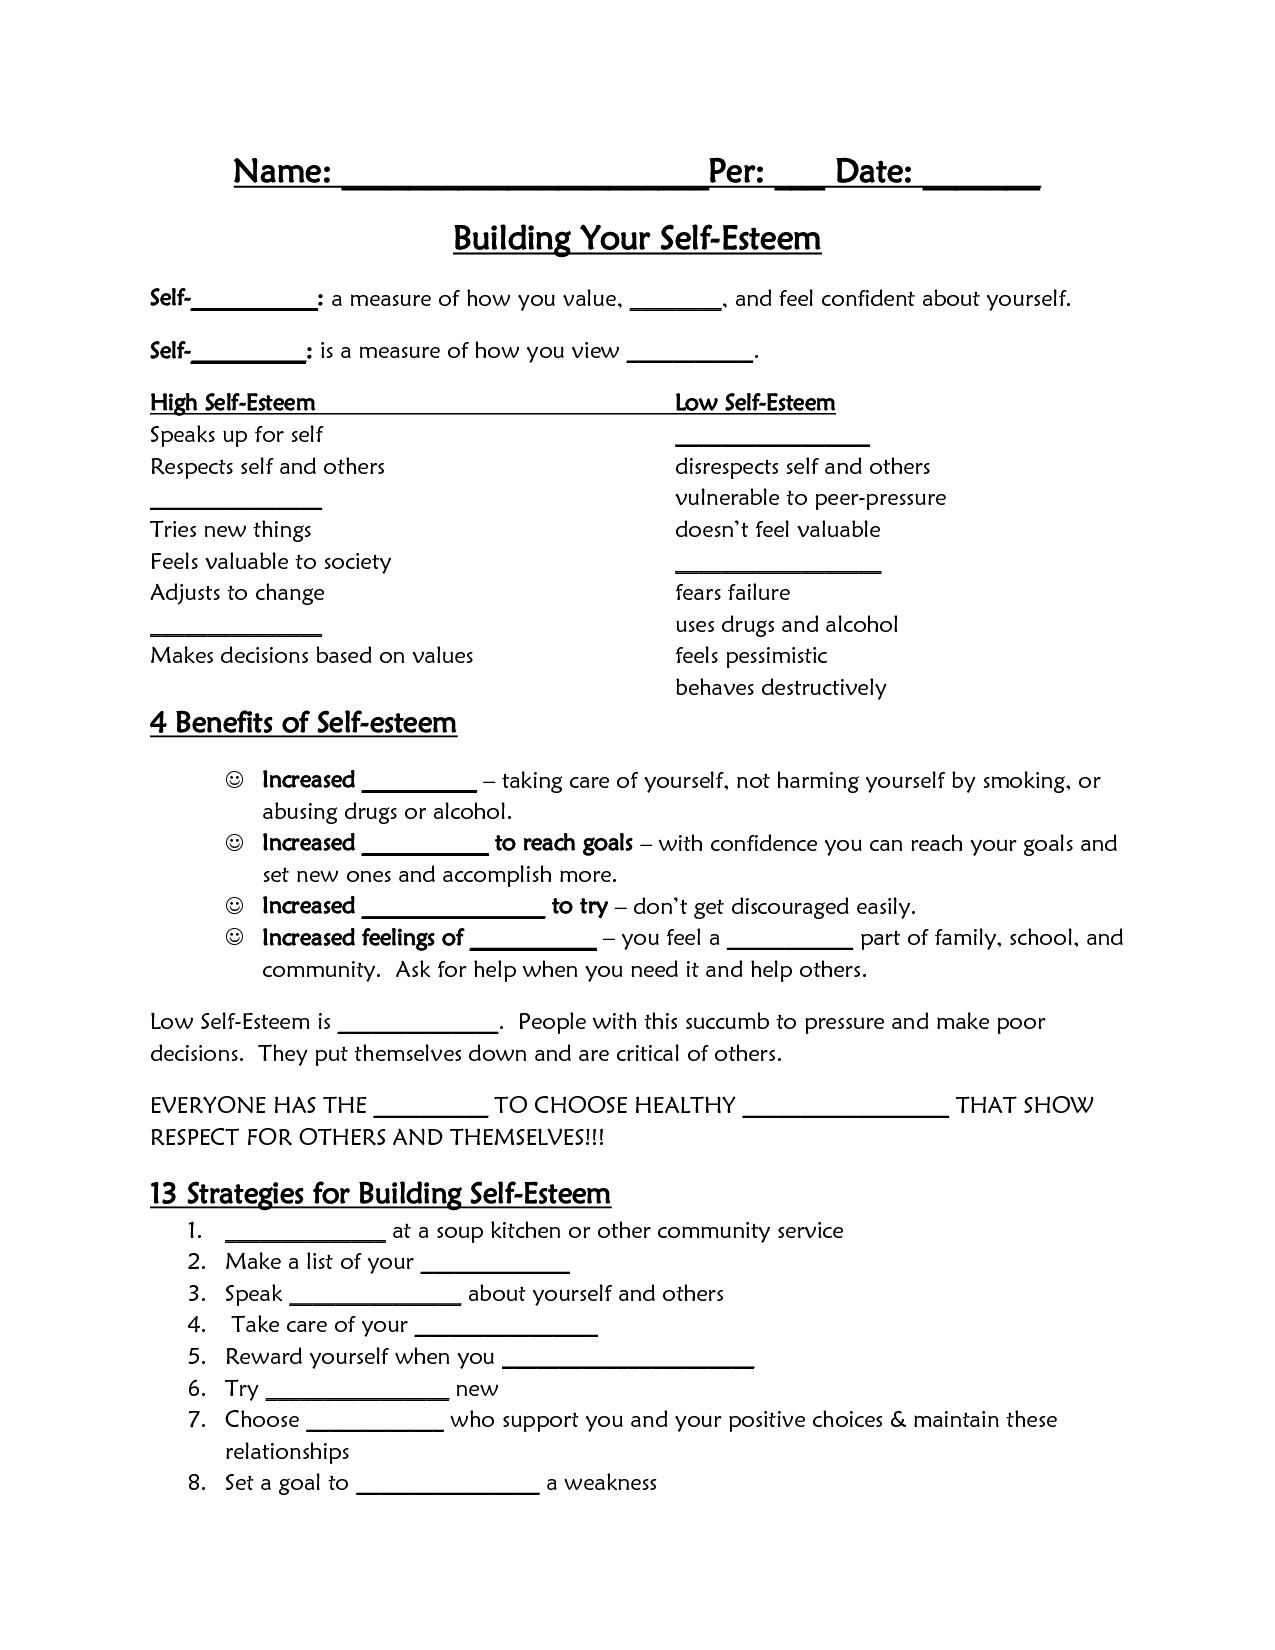 Self-Esteem Worksheet - Google Search | Self-Esteem/confidence | Self Esteem Building Worksheets Printable